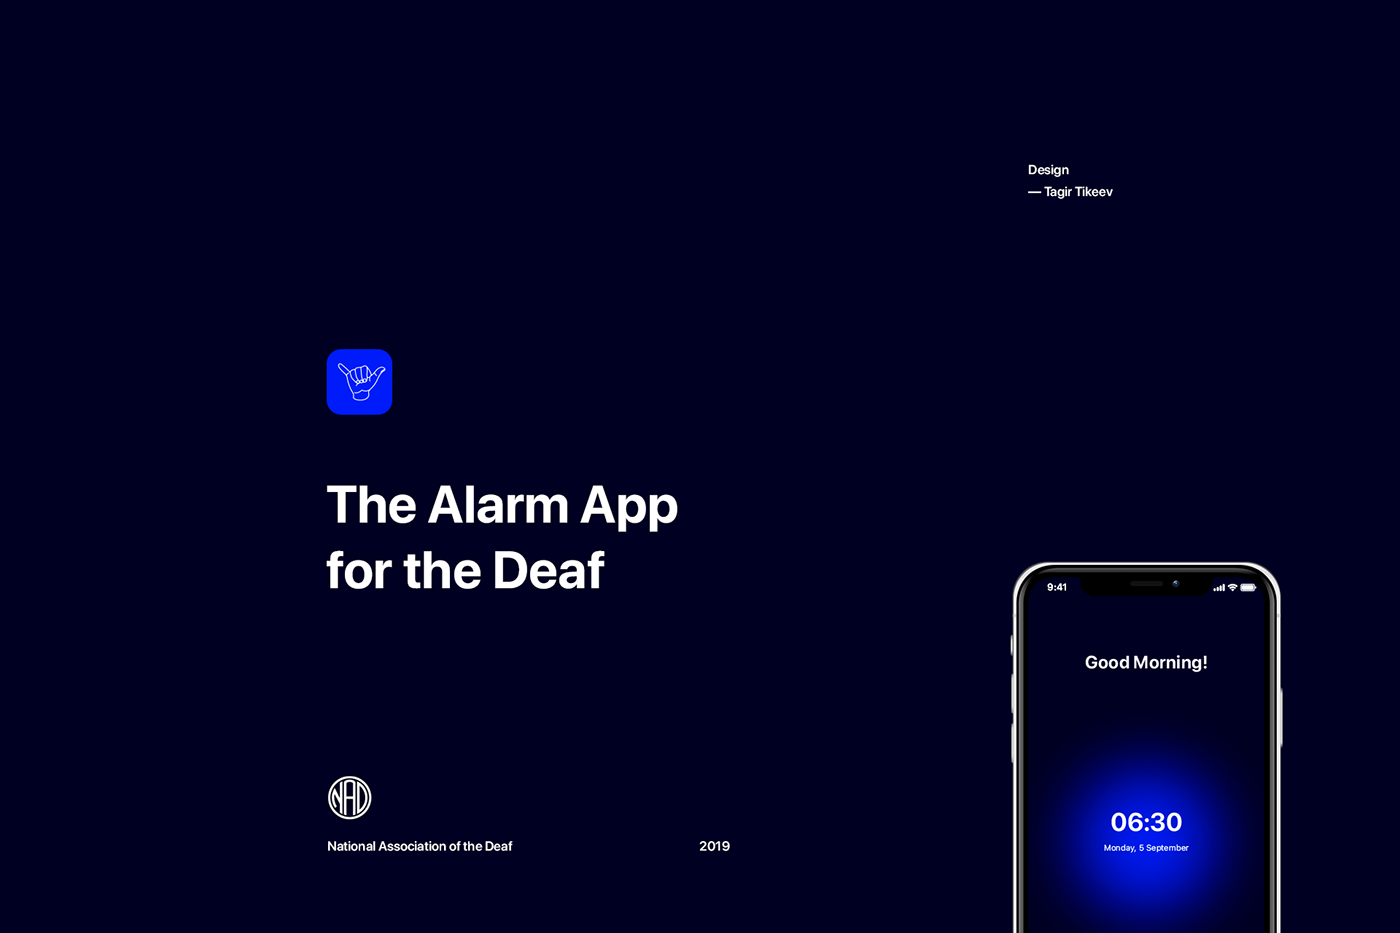 Alarm App for the Deaf